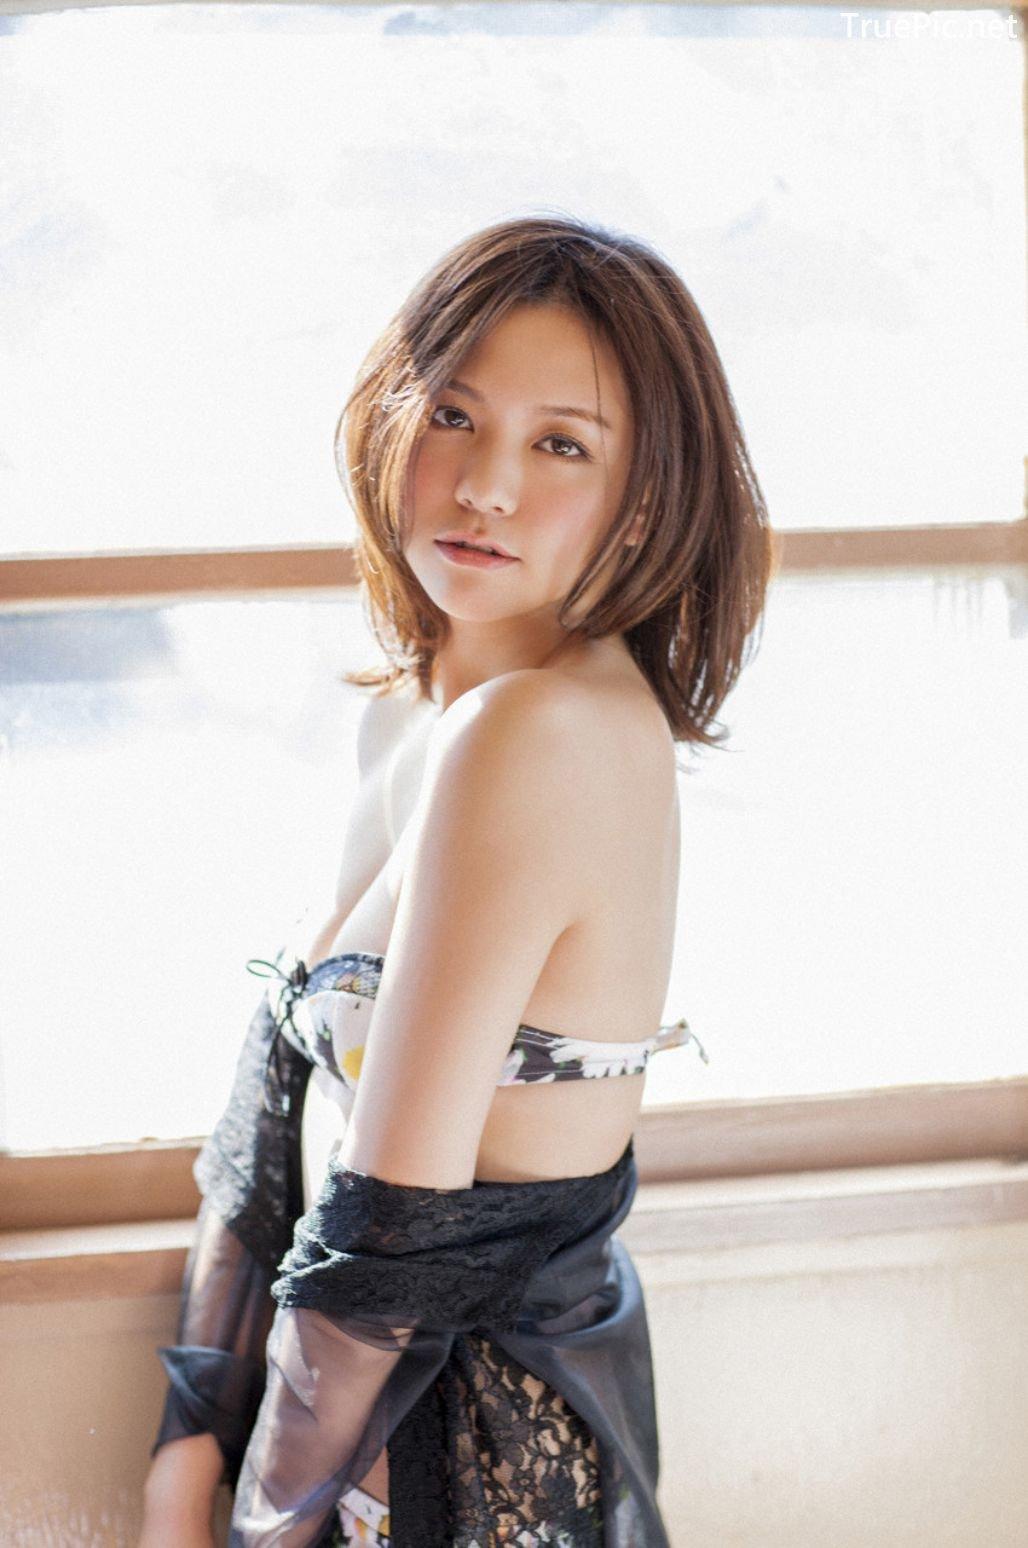 Image-Japanese-Actress-And-Model-Yuka-Konan-Hot-Beauty-Of-Angel-TruePic.net- Picture-4